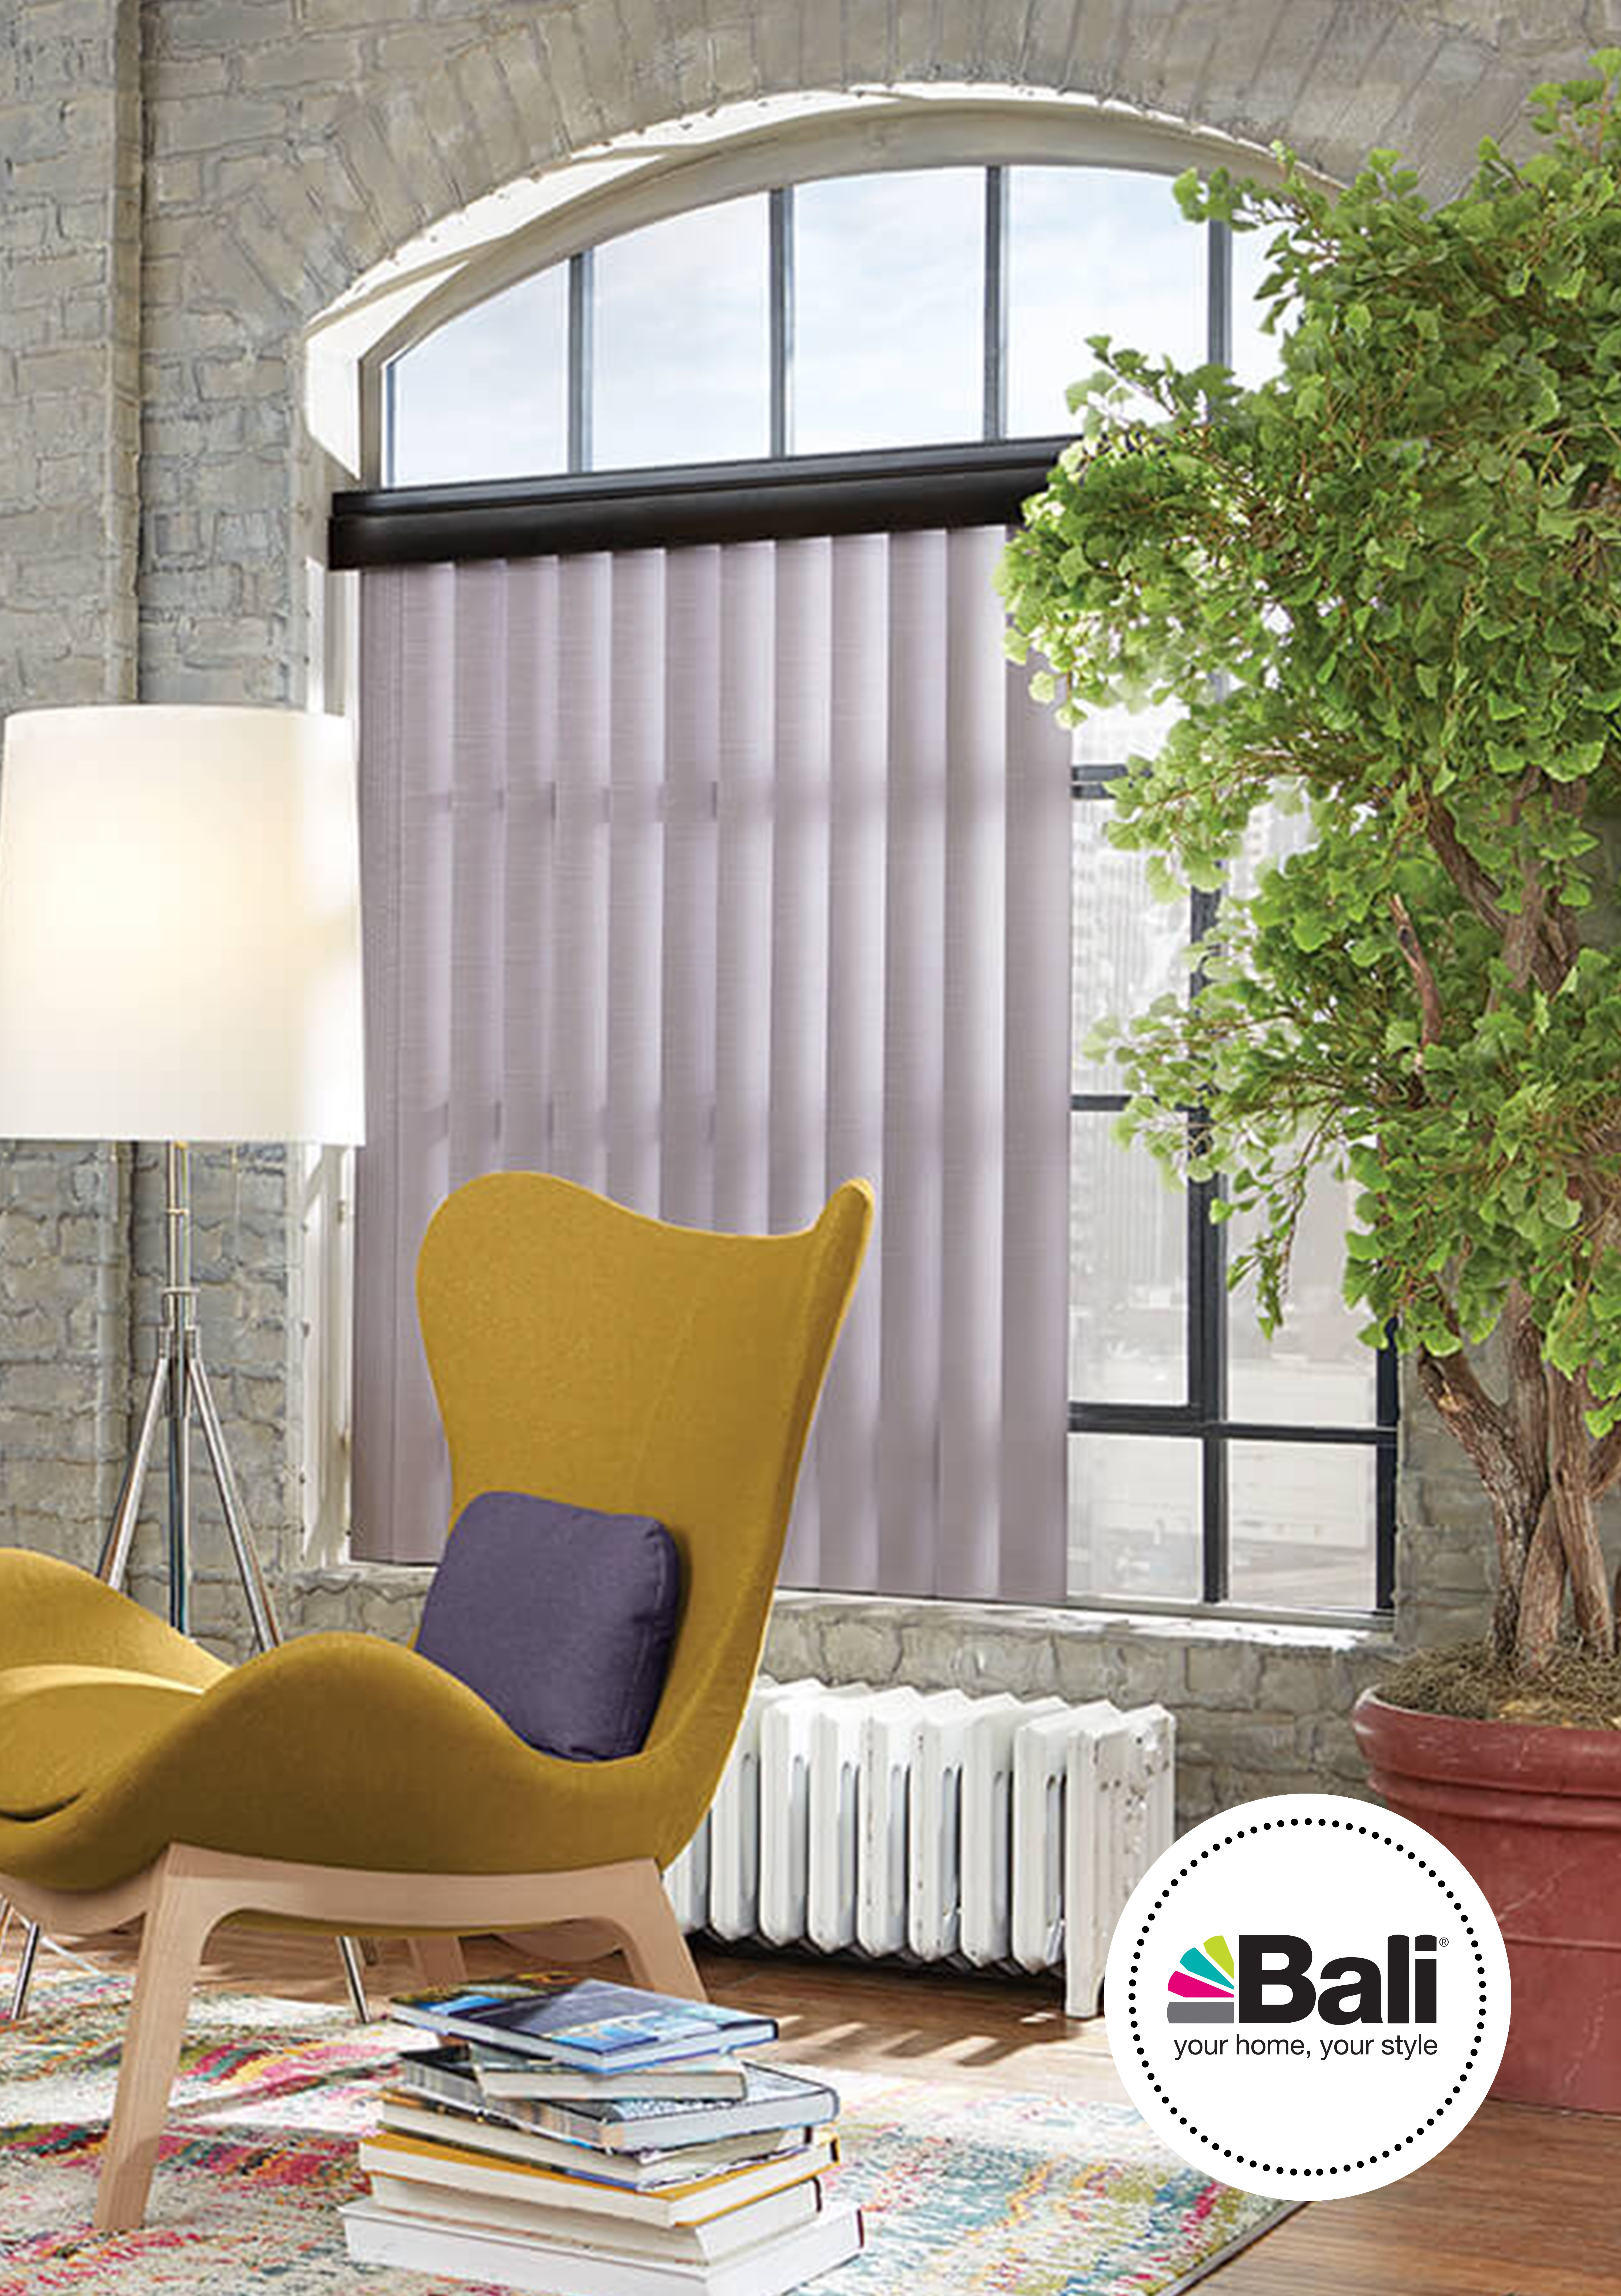 bali and window unbelievable custom blinds of sheer shutters draperies enchantment ideas xfile uncategorized popular vertical shades treatments